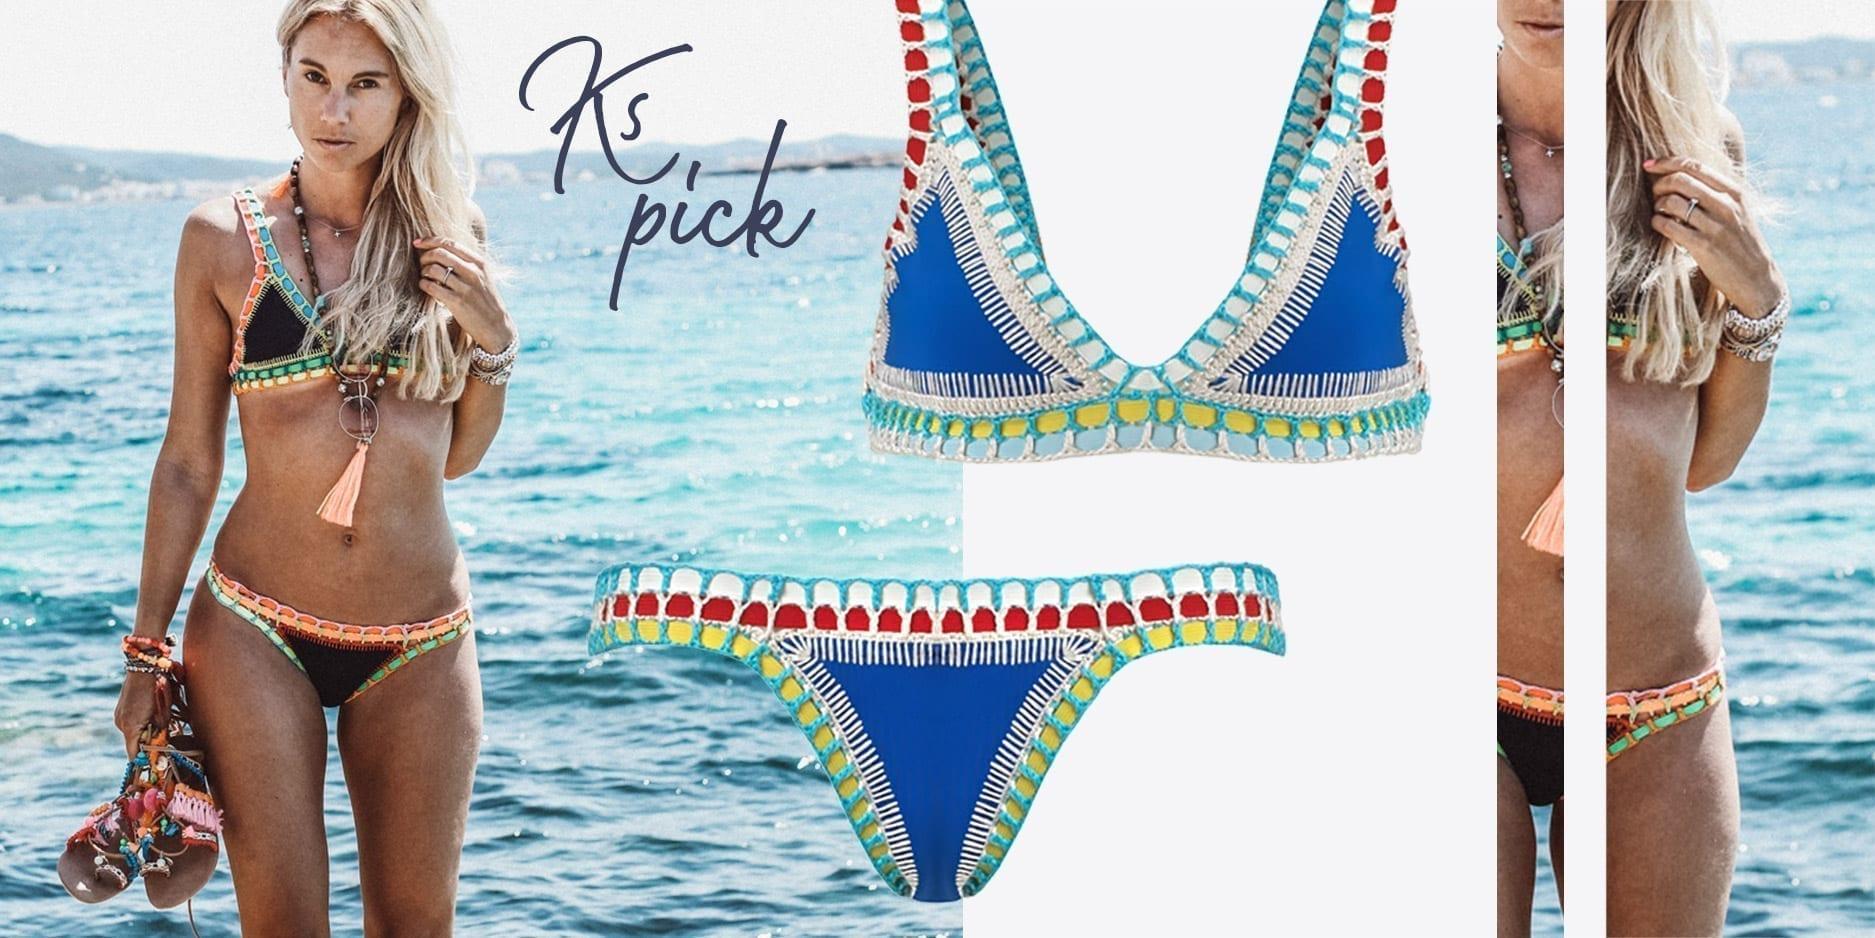 CK_monthly-pick-1606_Ks-pick-kiini-bikini-karin-kaswurm_01